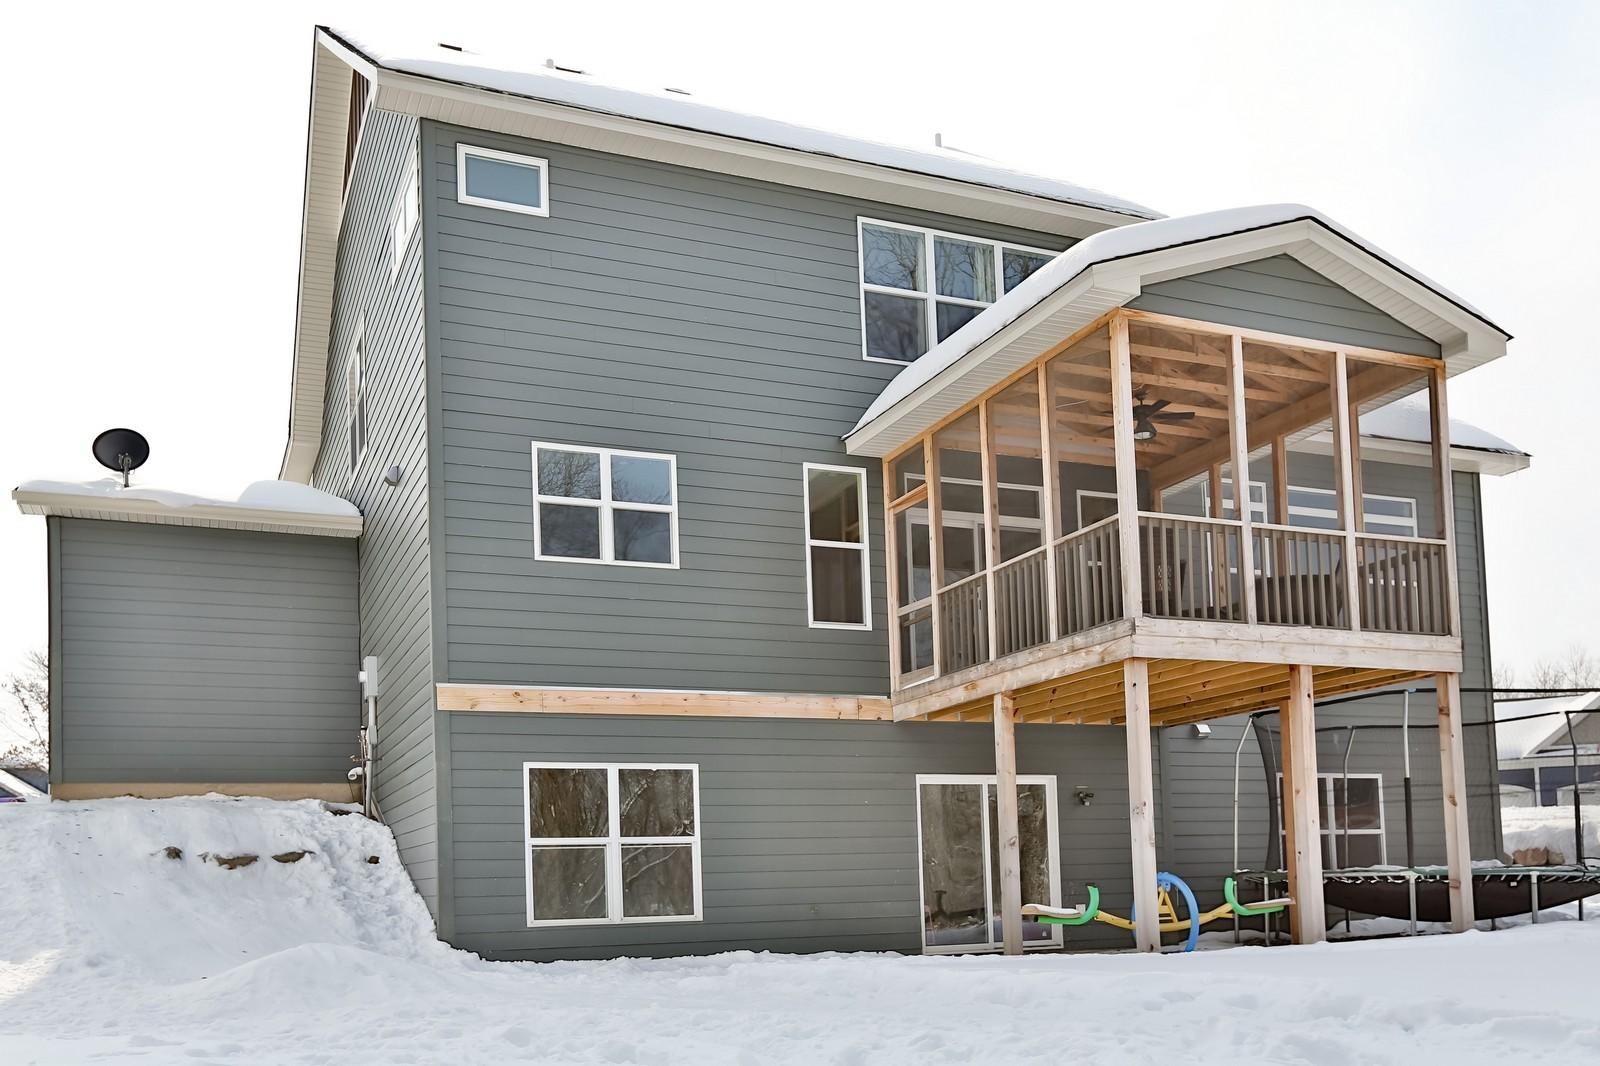 Real Estate Photography - 859 Fox Rd, Lino Lakes, MN, 55014 - Back Yard